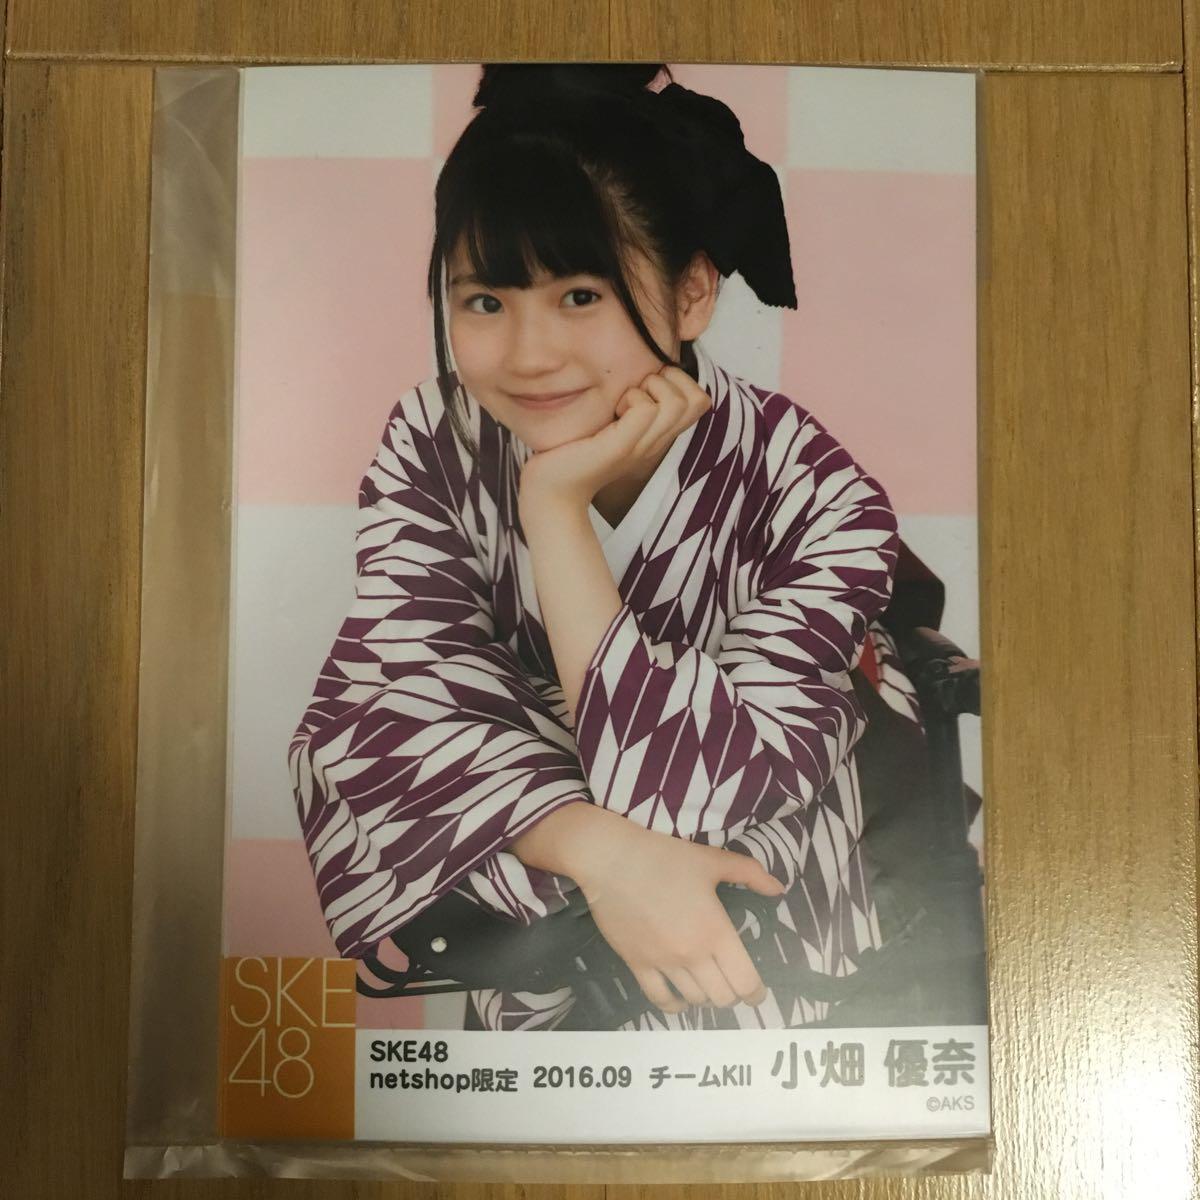 SKE48 小畑優奈 生写真 2016.9 netshop限定 5枚コンプ(未開封)